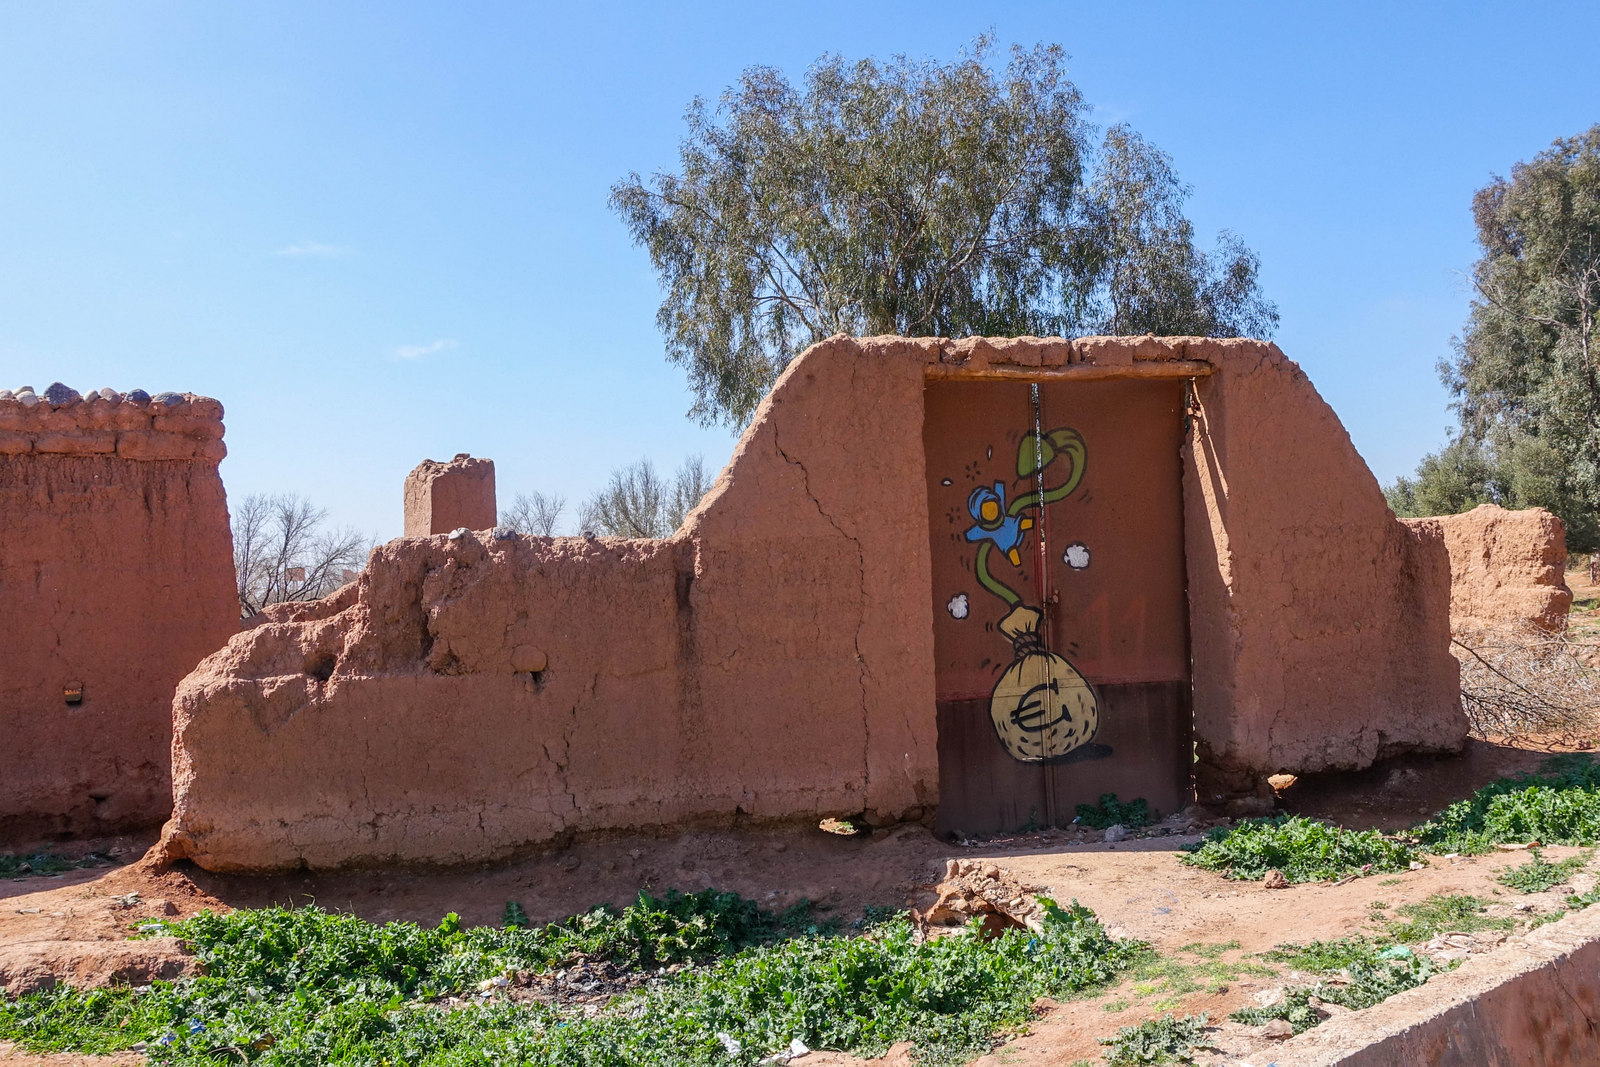 jardin rouge – streetart in den umliegenden dörfern